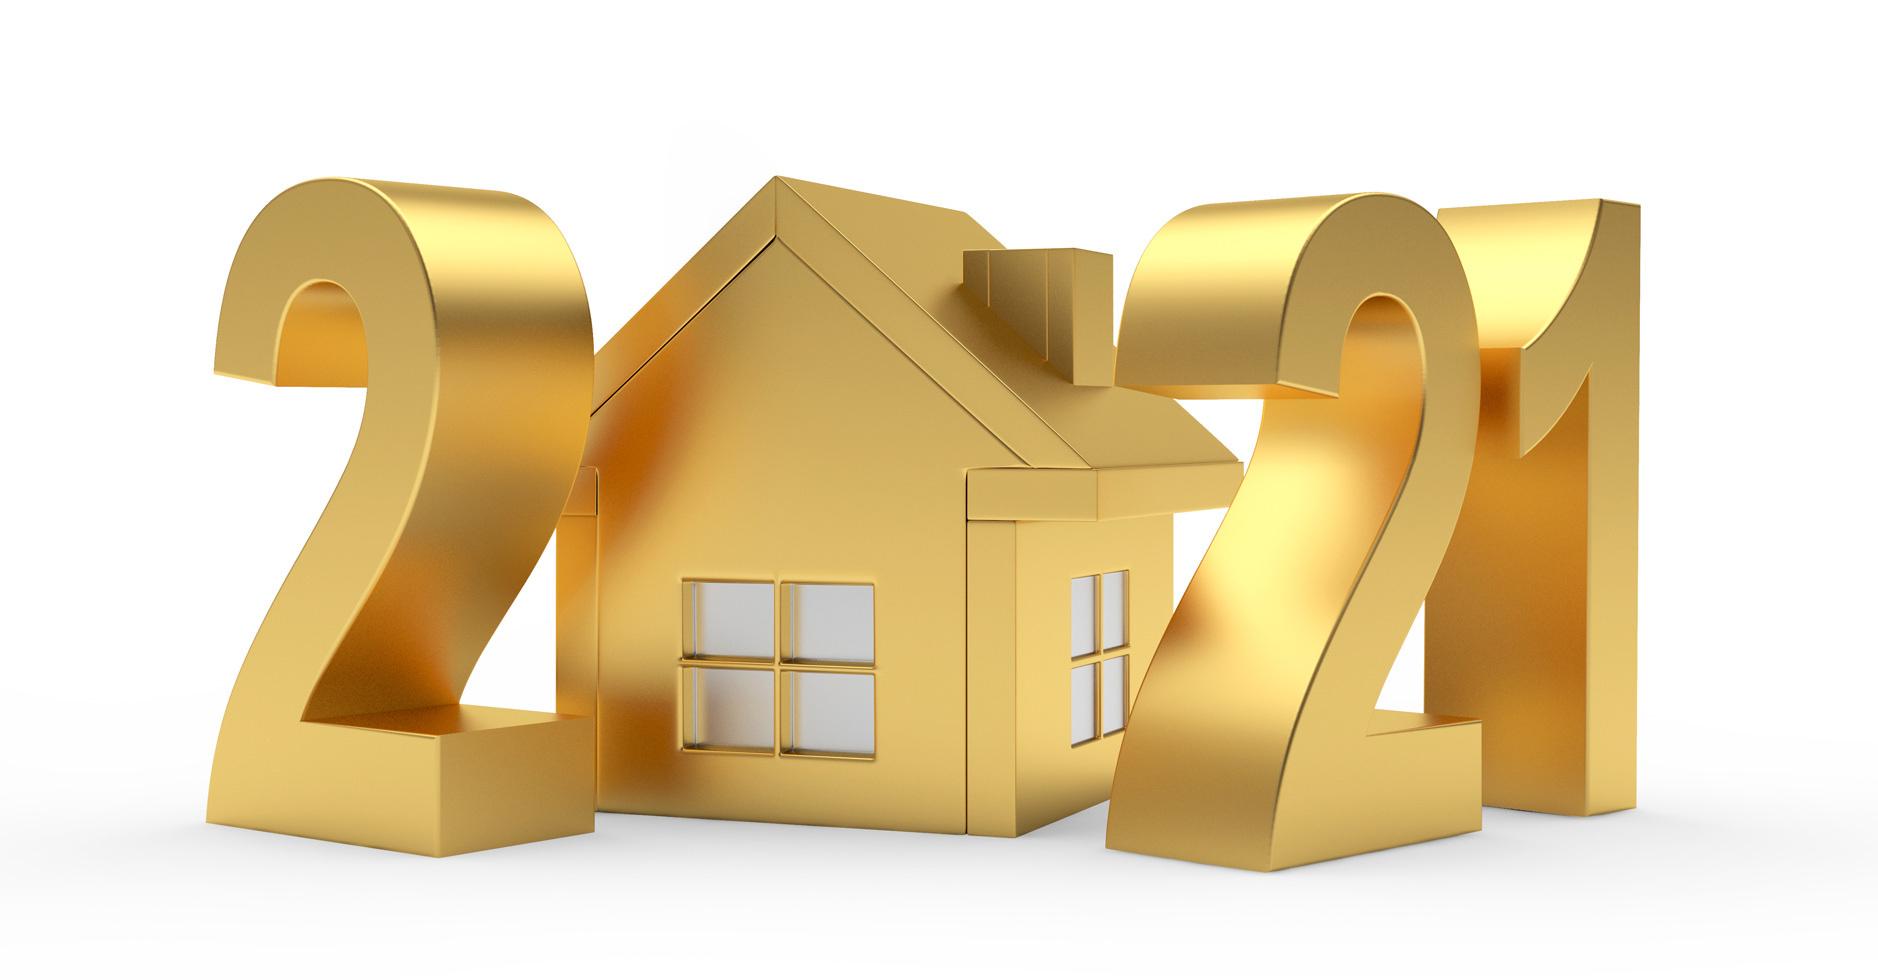 TerriScheer NewYear 2021 Image Australia's Top Property Managers Among REIA Finalists